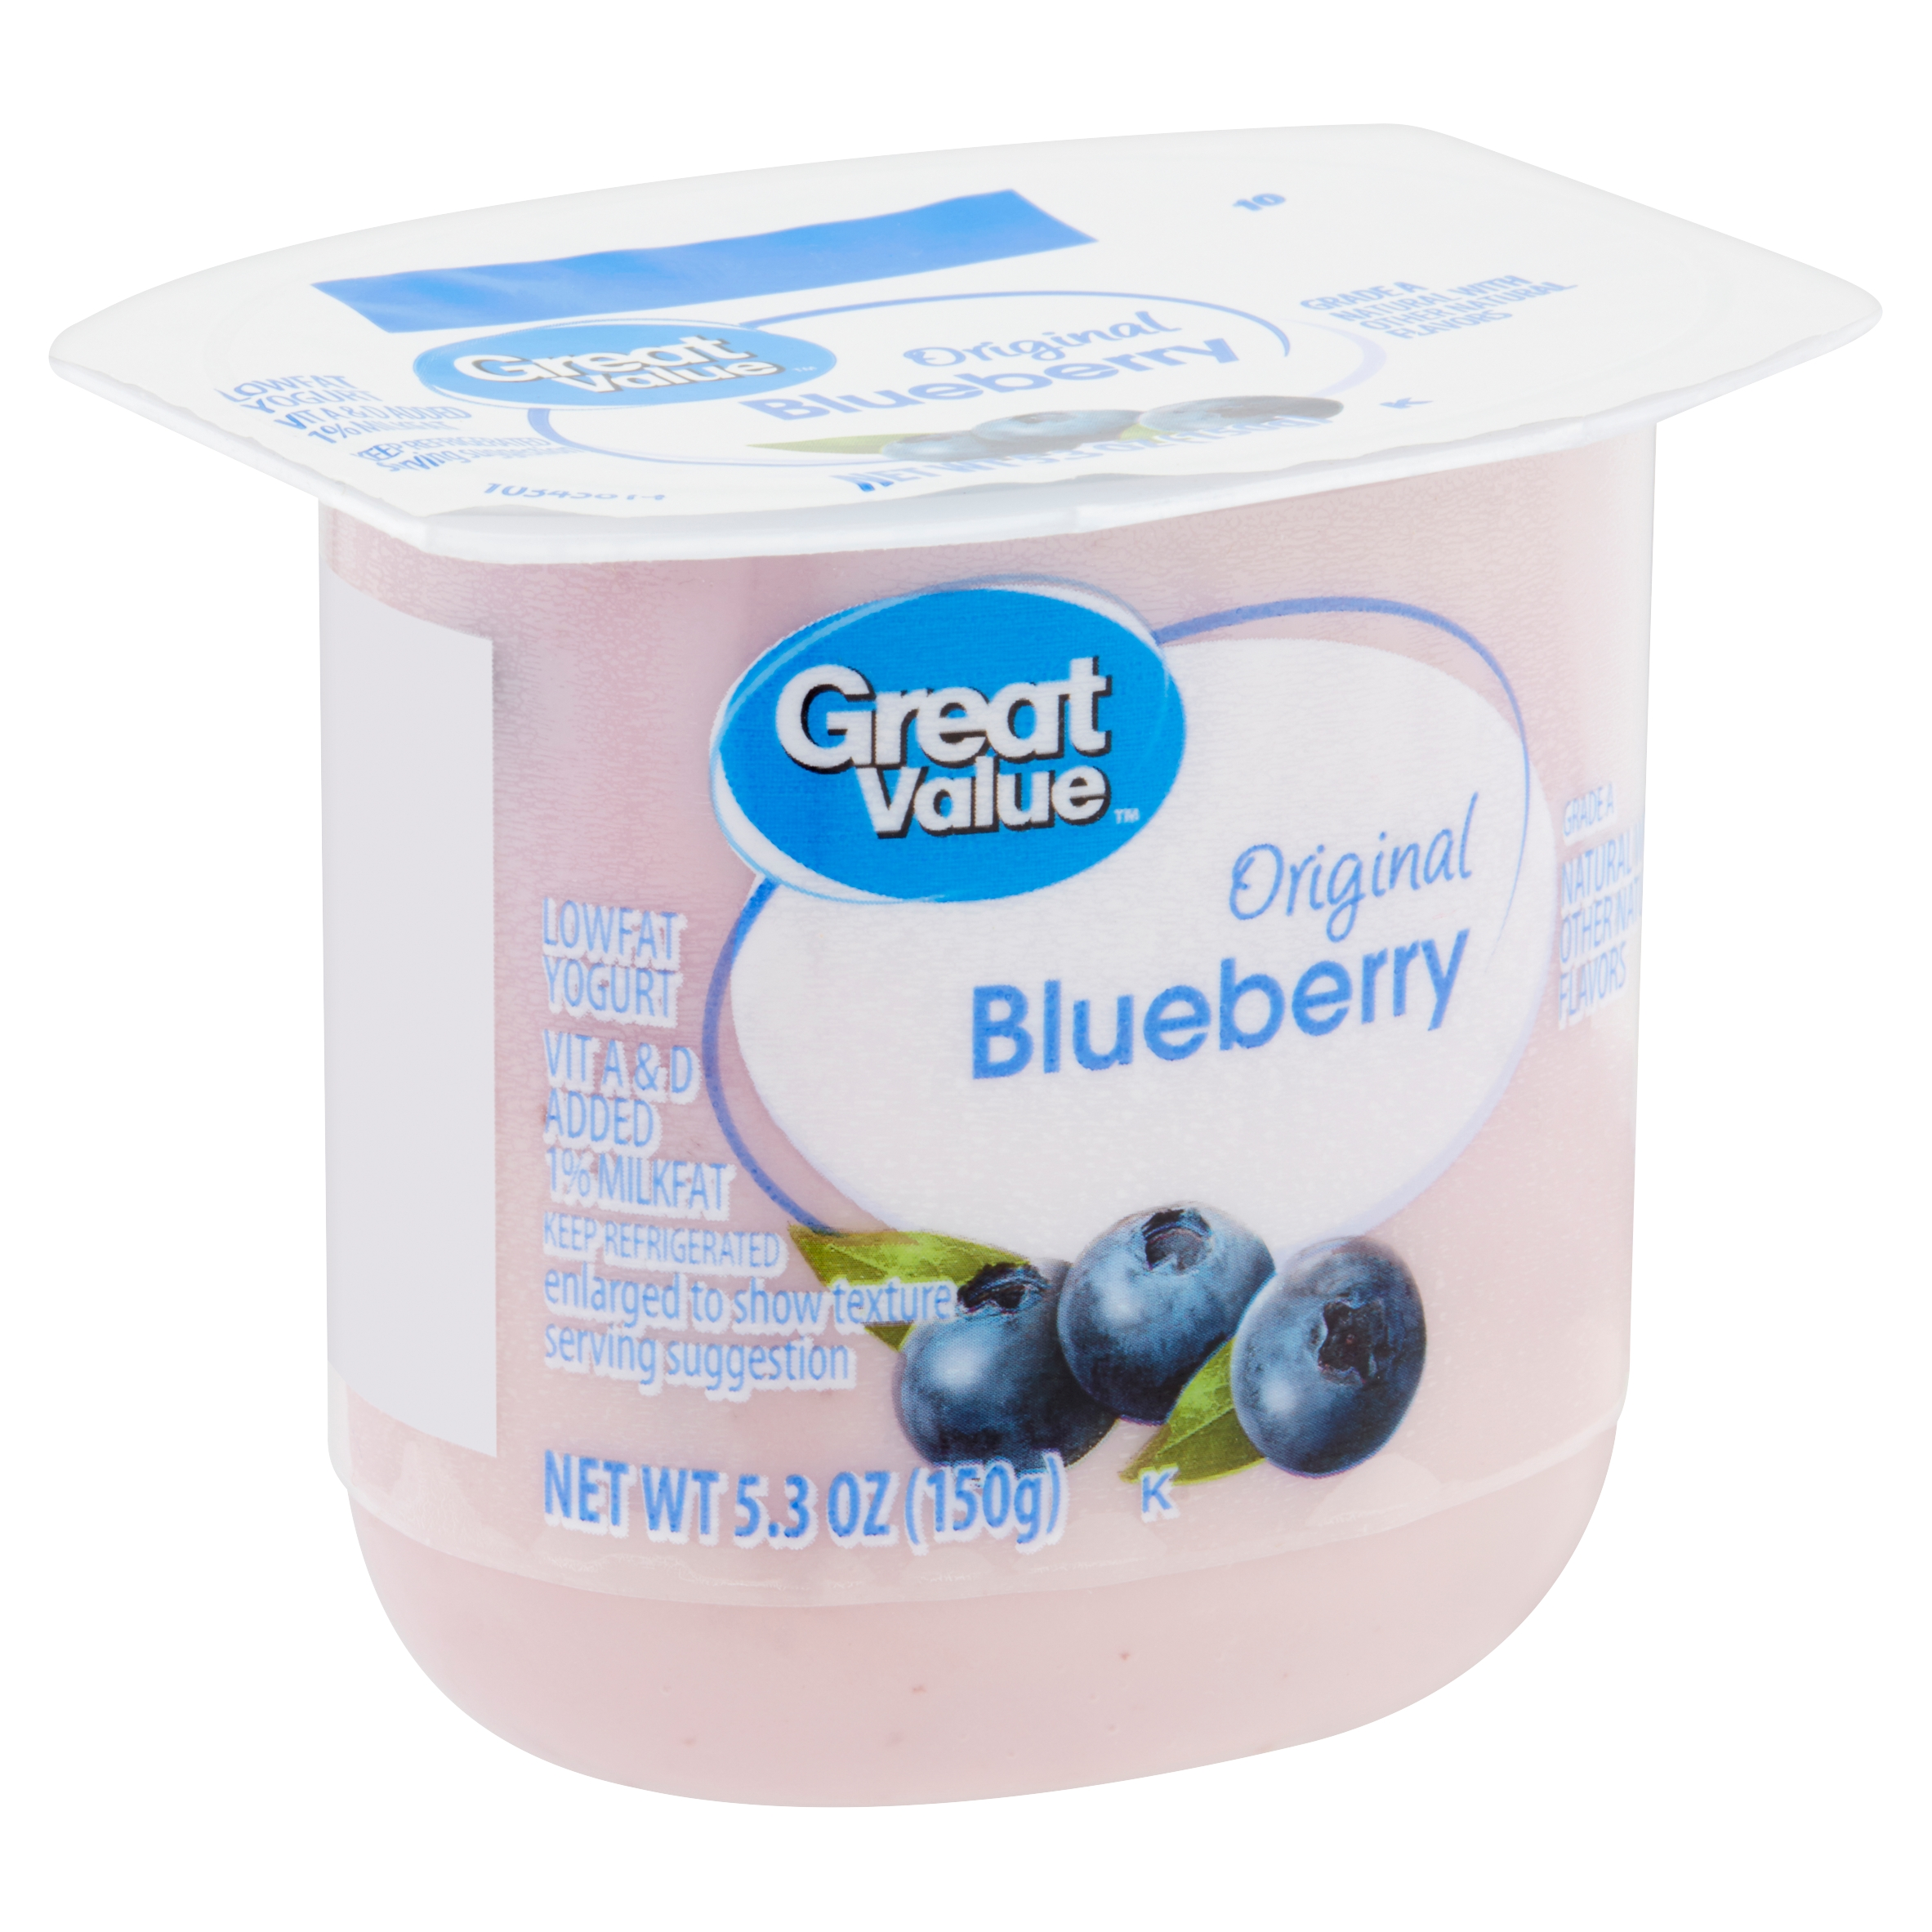 Great Value Original Blueberry Lowfat Yogurt, 5.3 oz